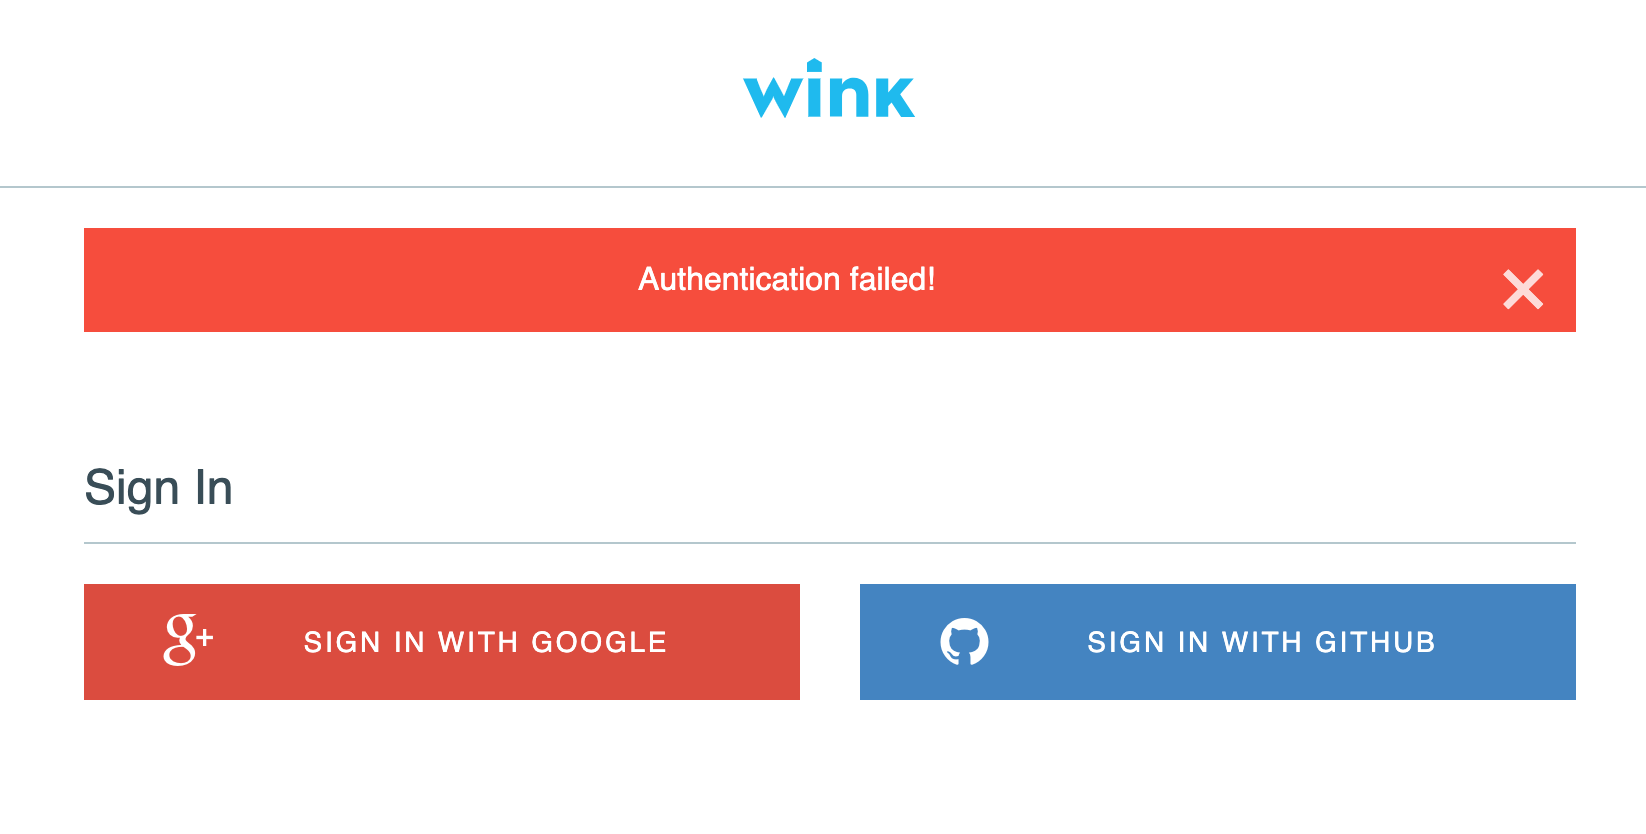 In wink sign WINK